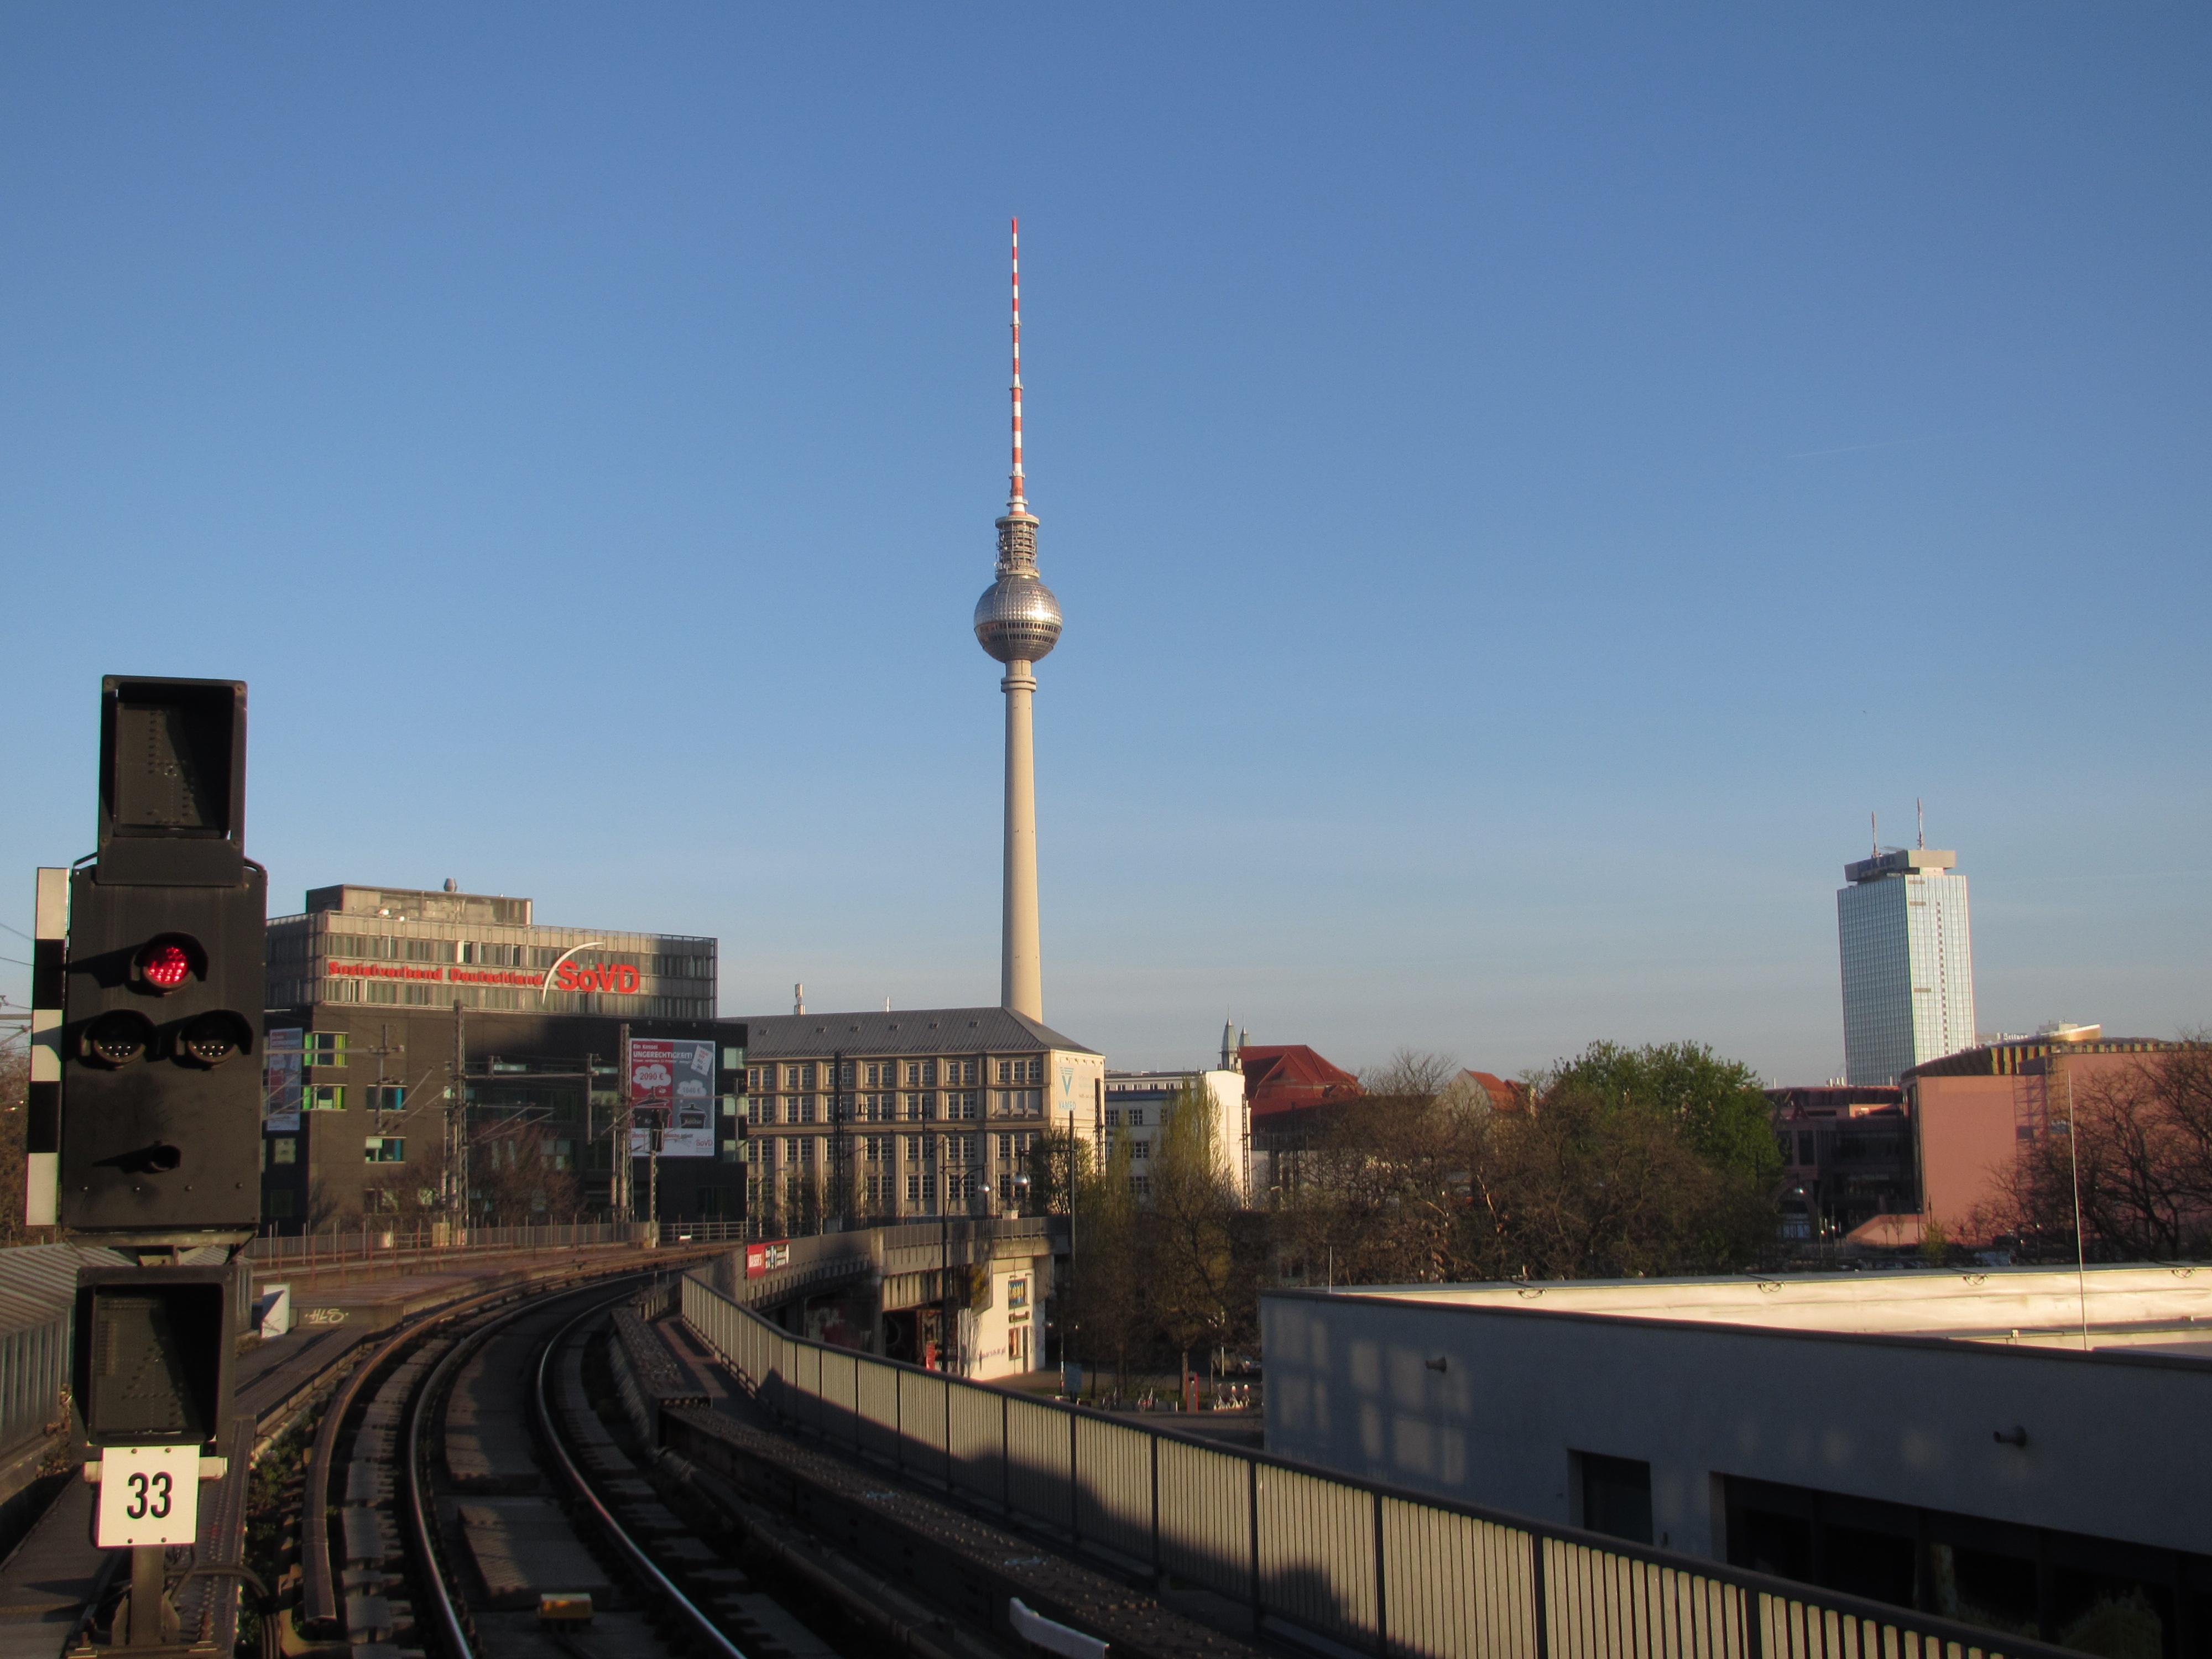 You resolution Deutschland Alexa Ranking you are seeking